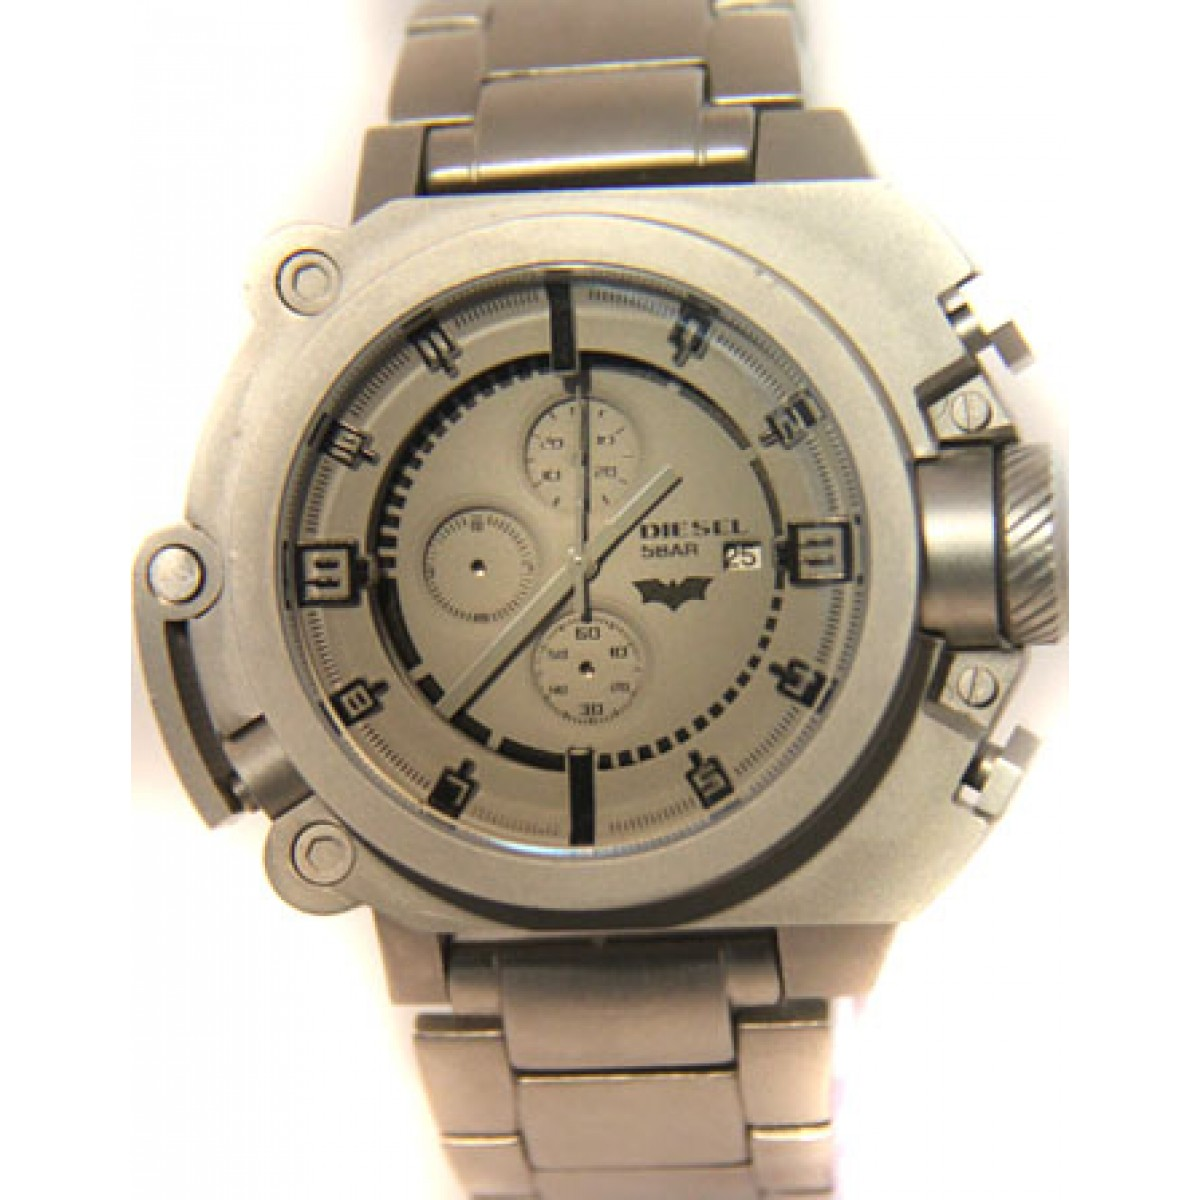 3be687d9da4d2 Relógio Réplica Diesel Batman